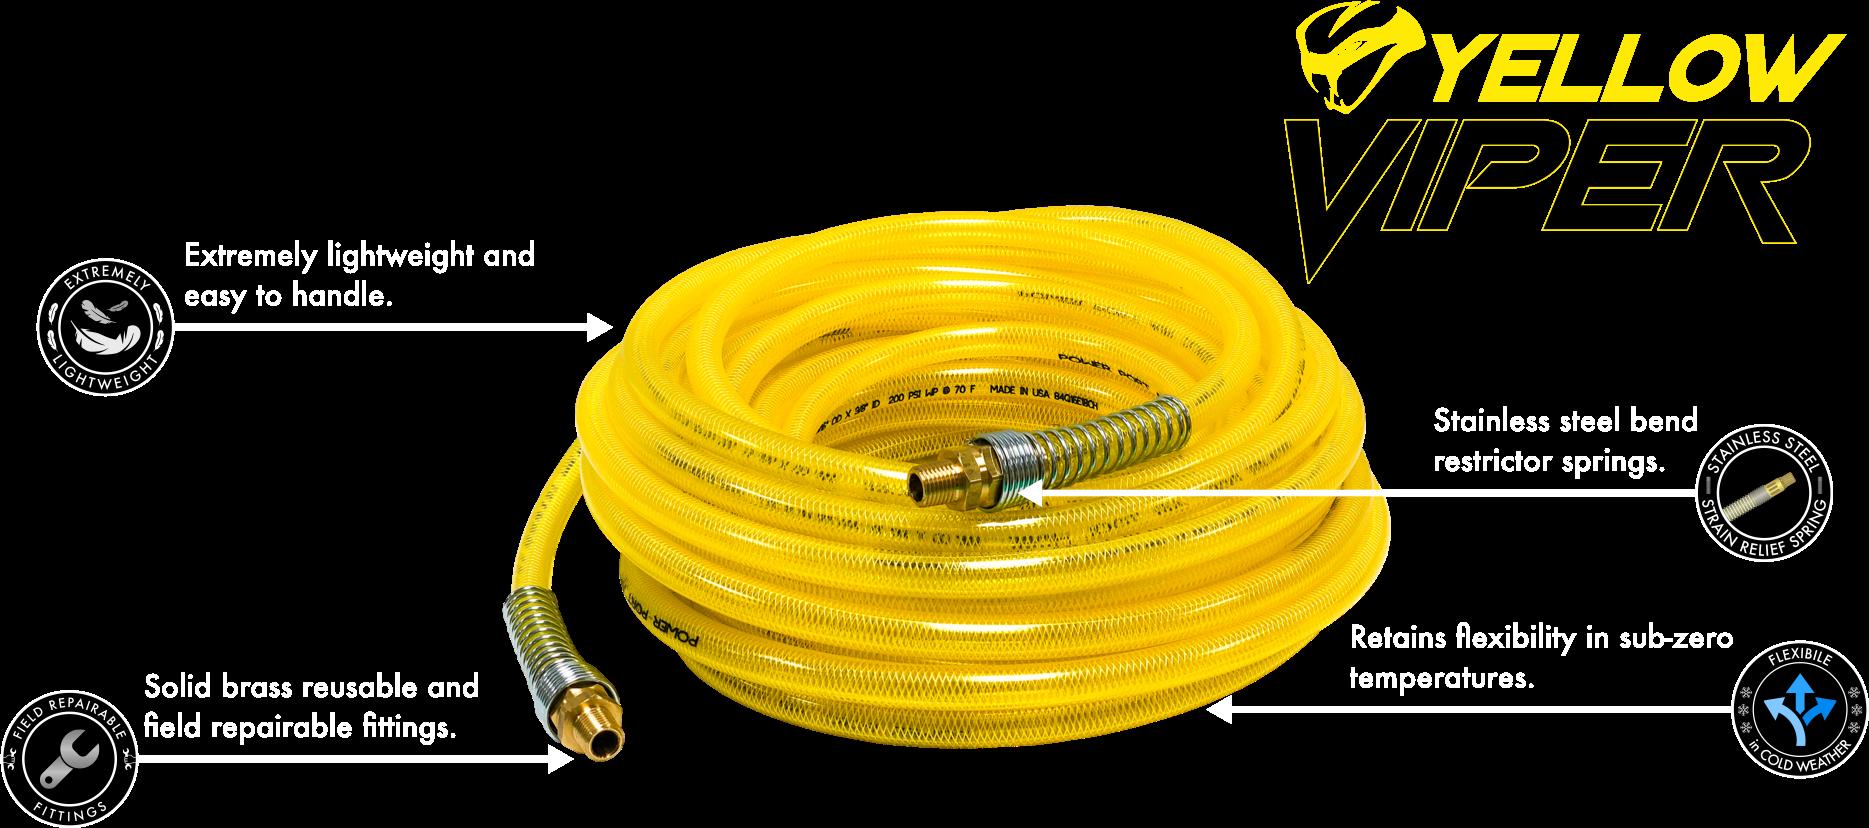 Yellow Viper Polyurethane Air Hose